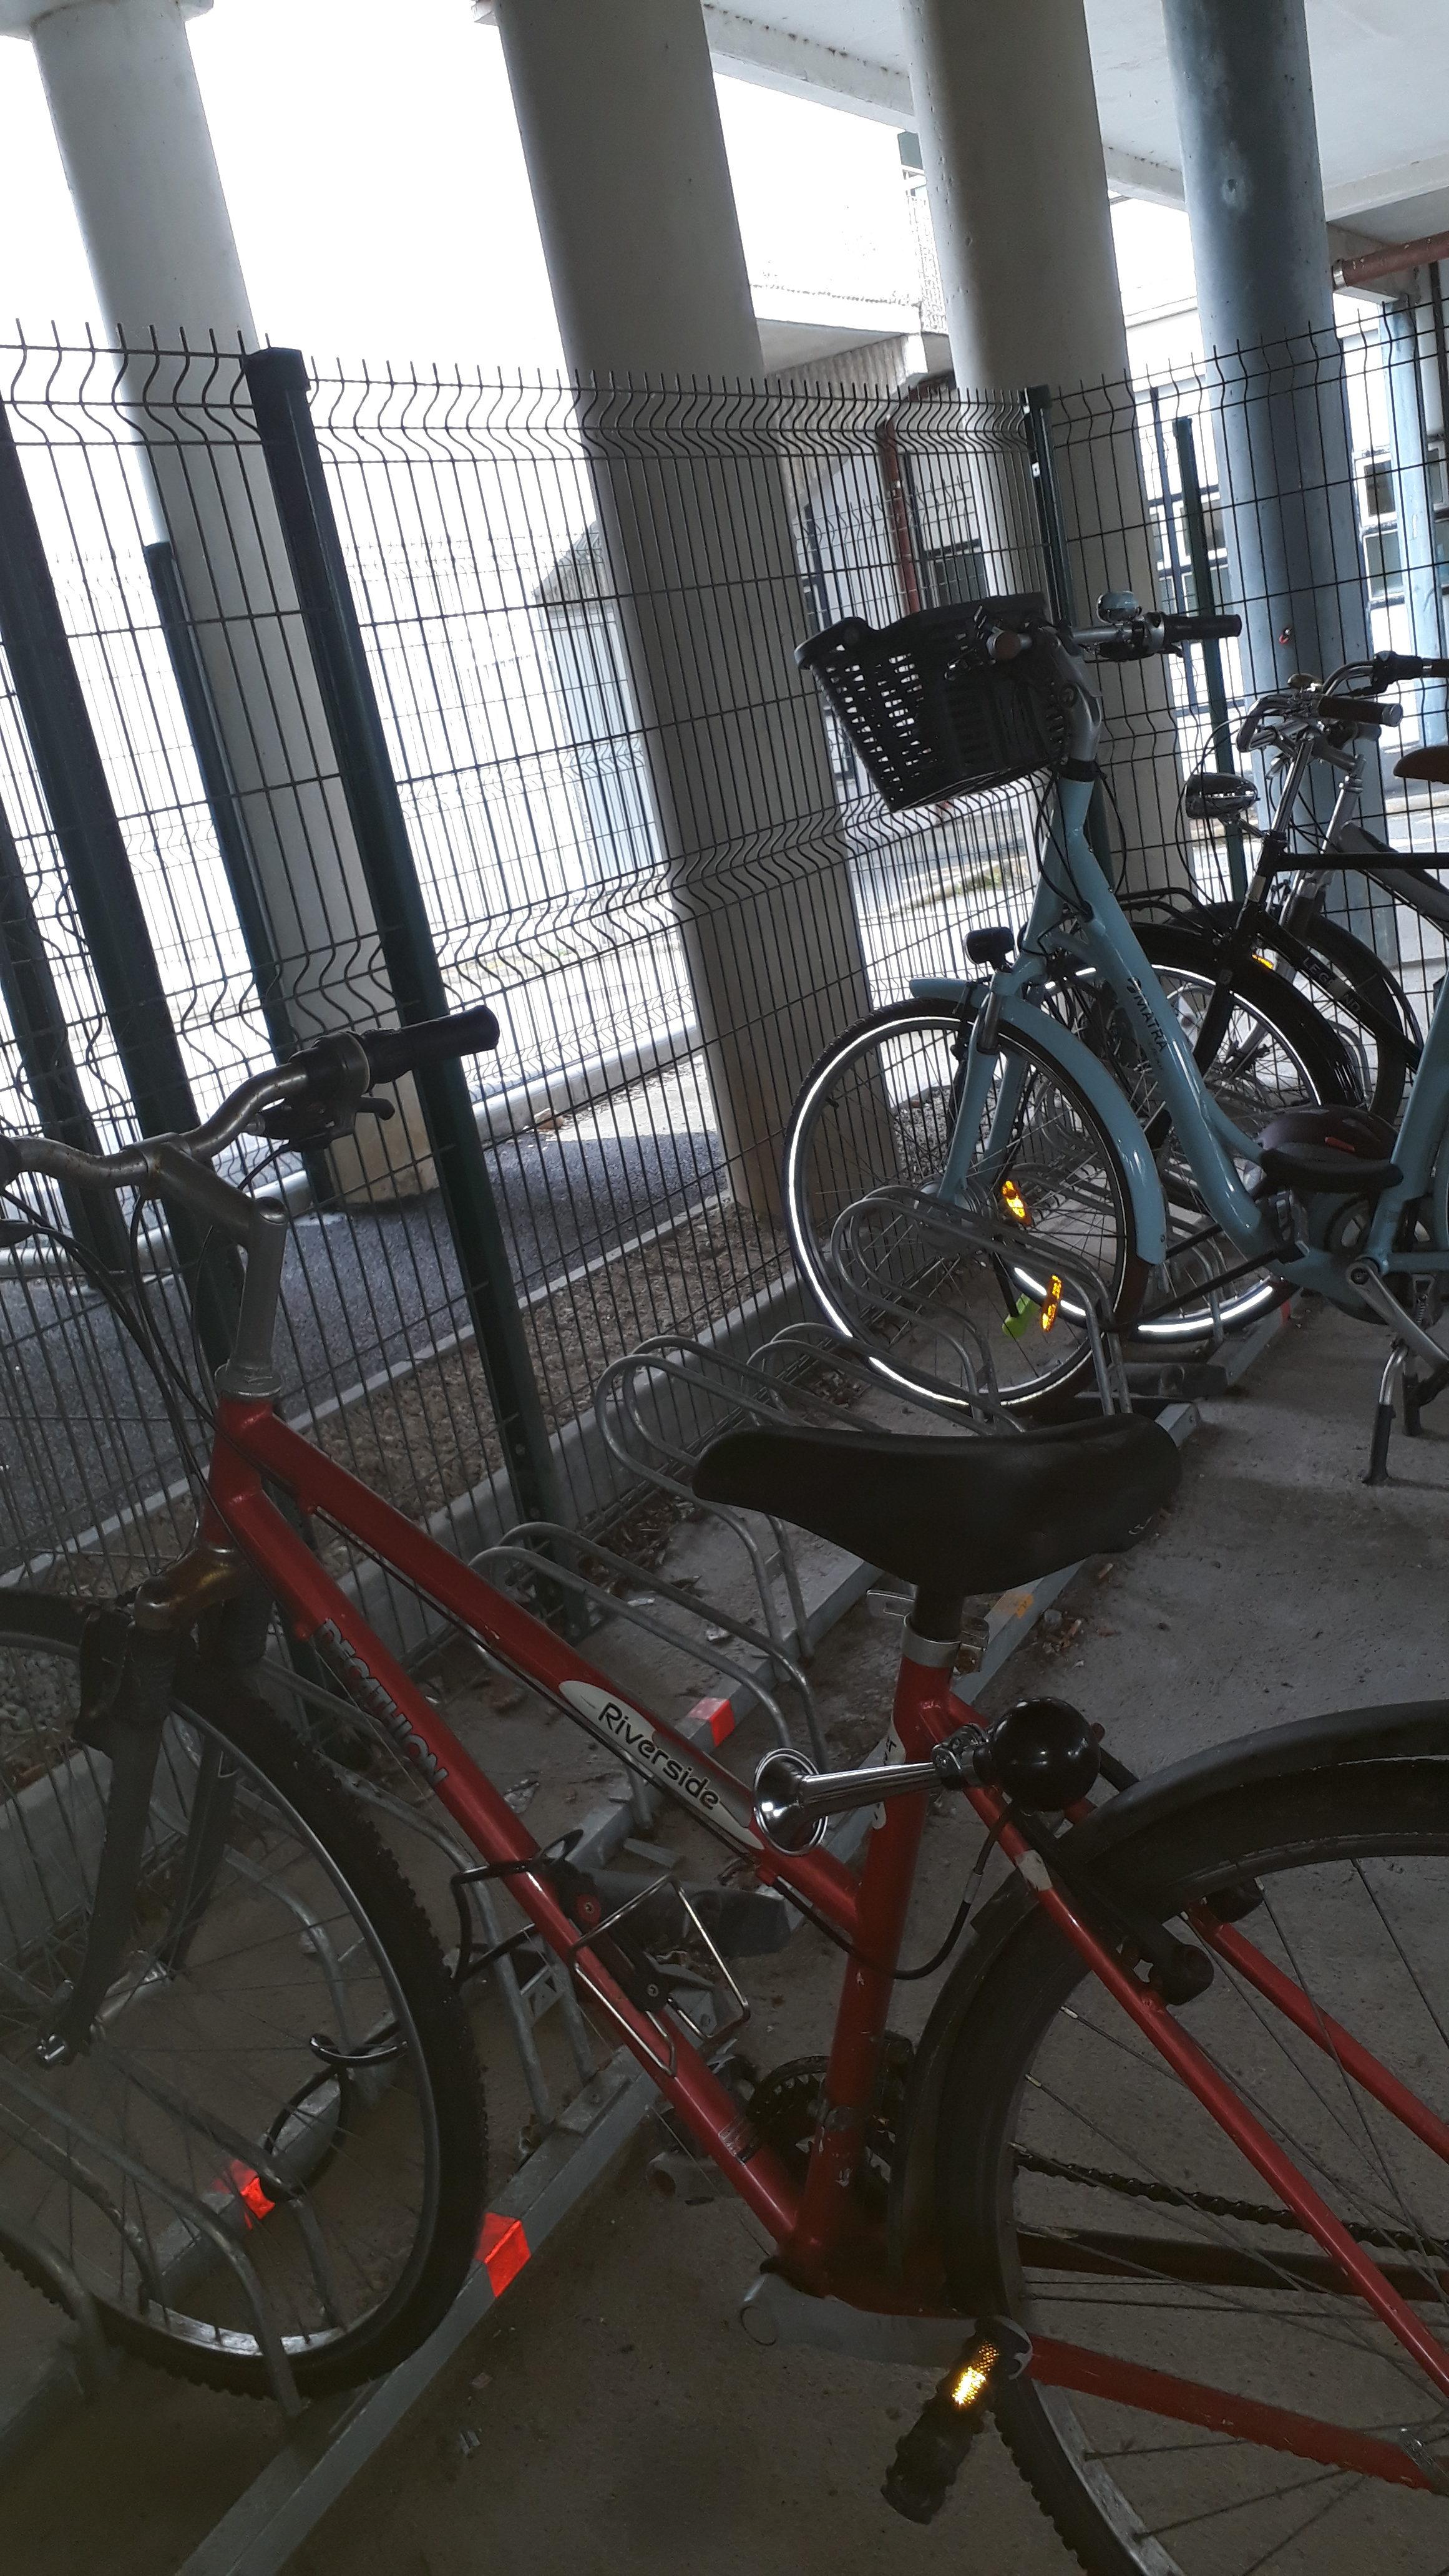 Edwina FRUCHART – Garage à Vélo